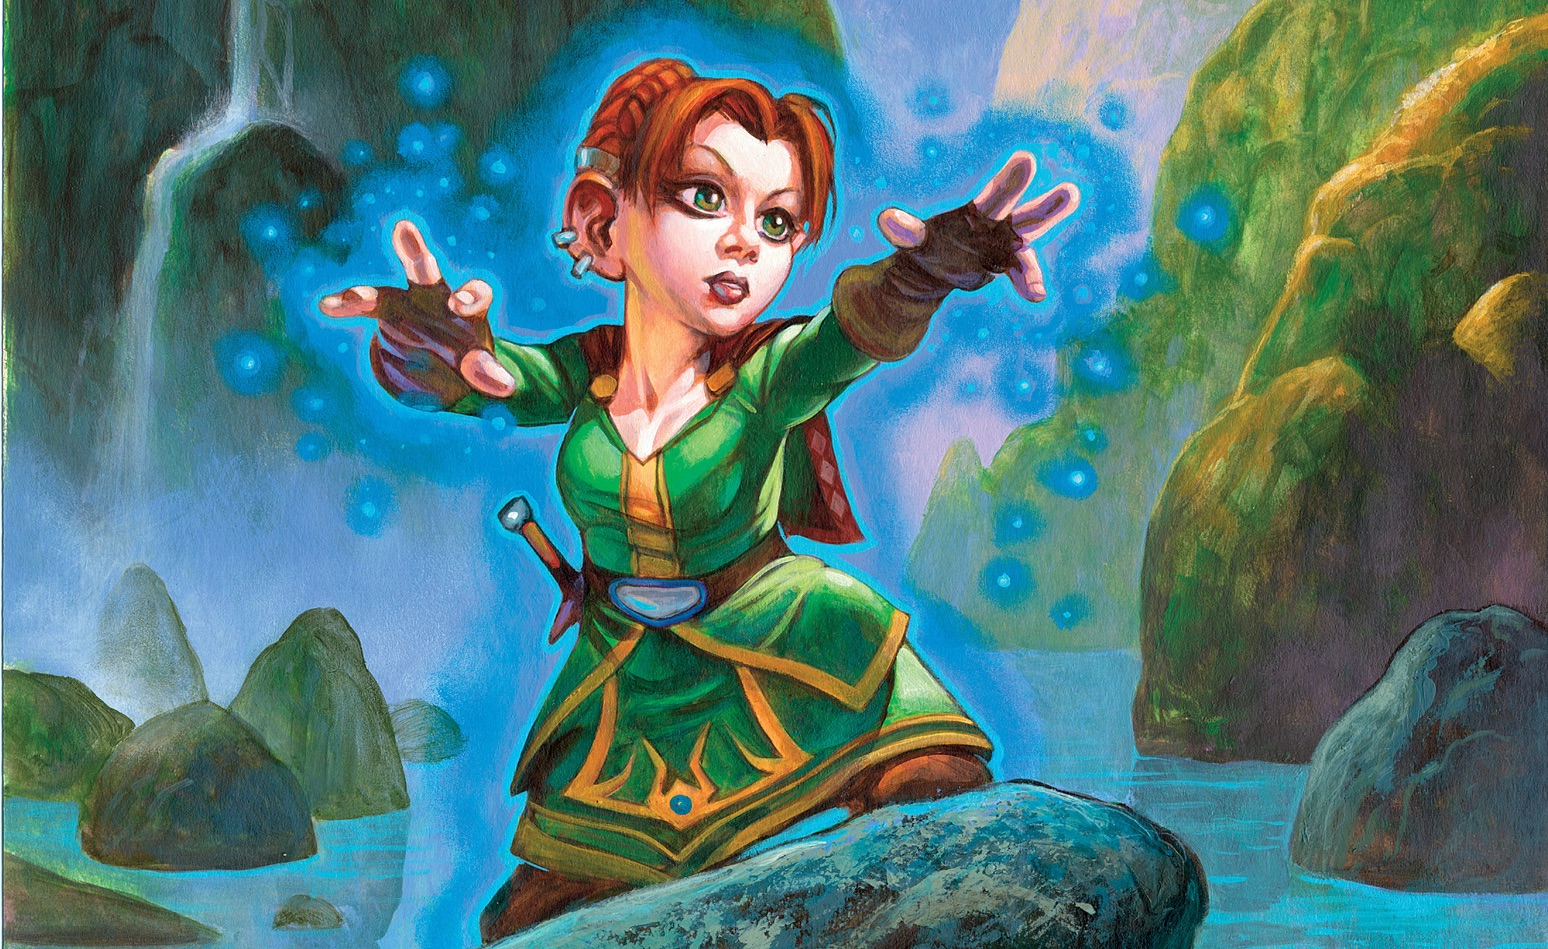 header-sorcerers-apprentice-mage